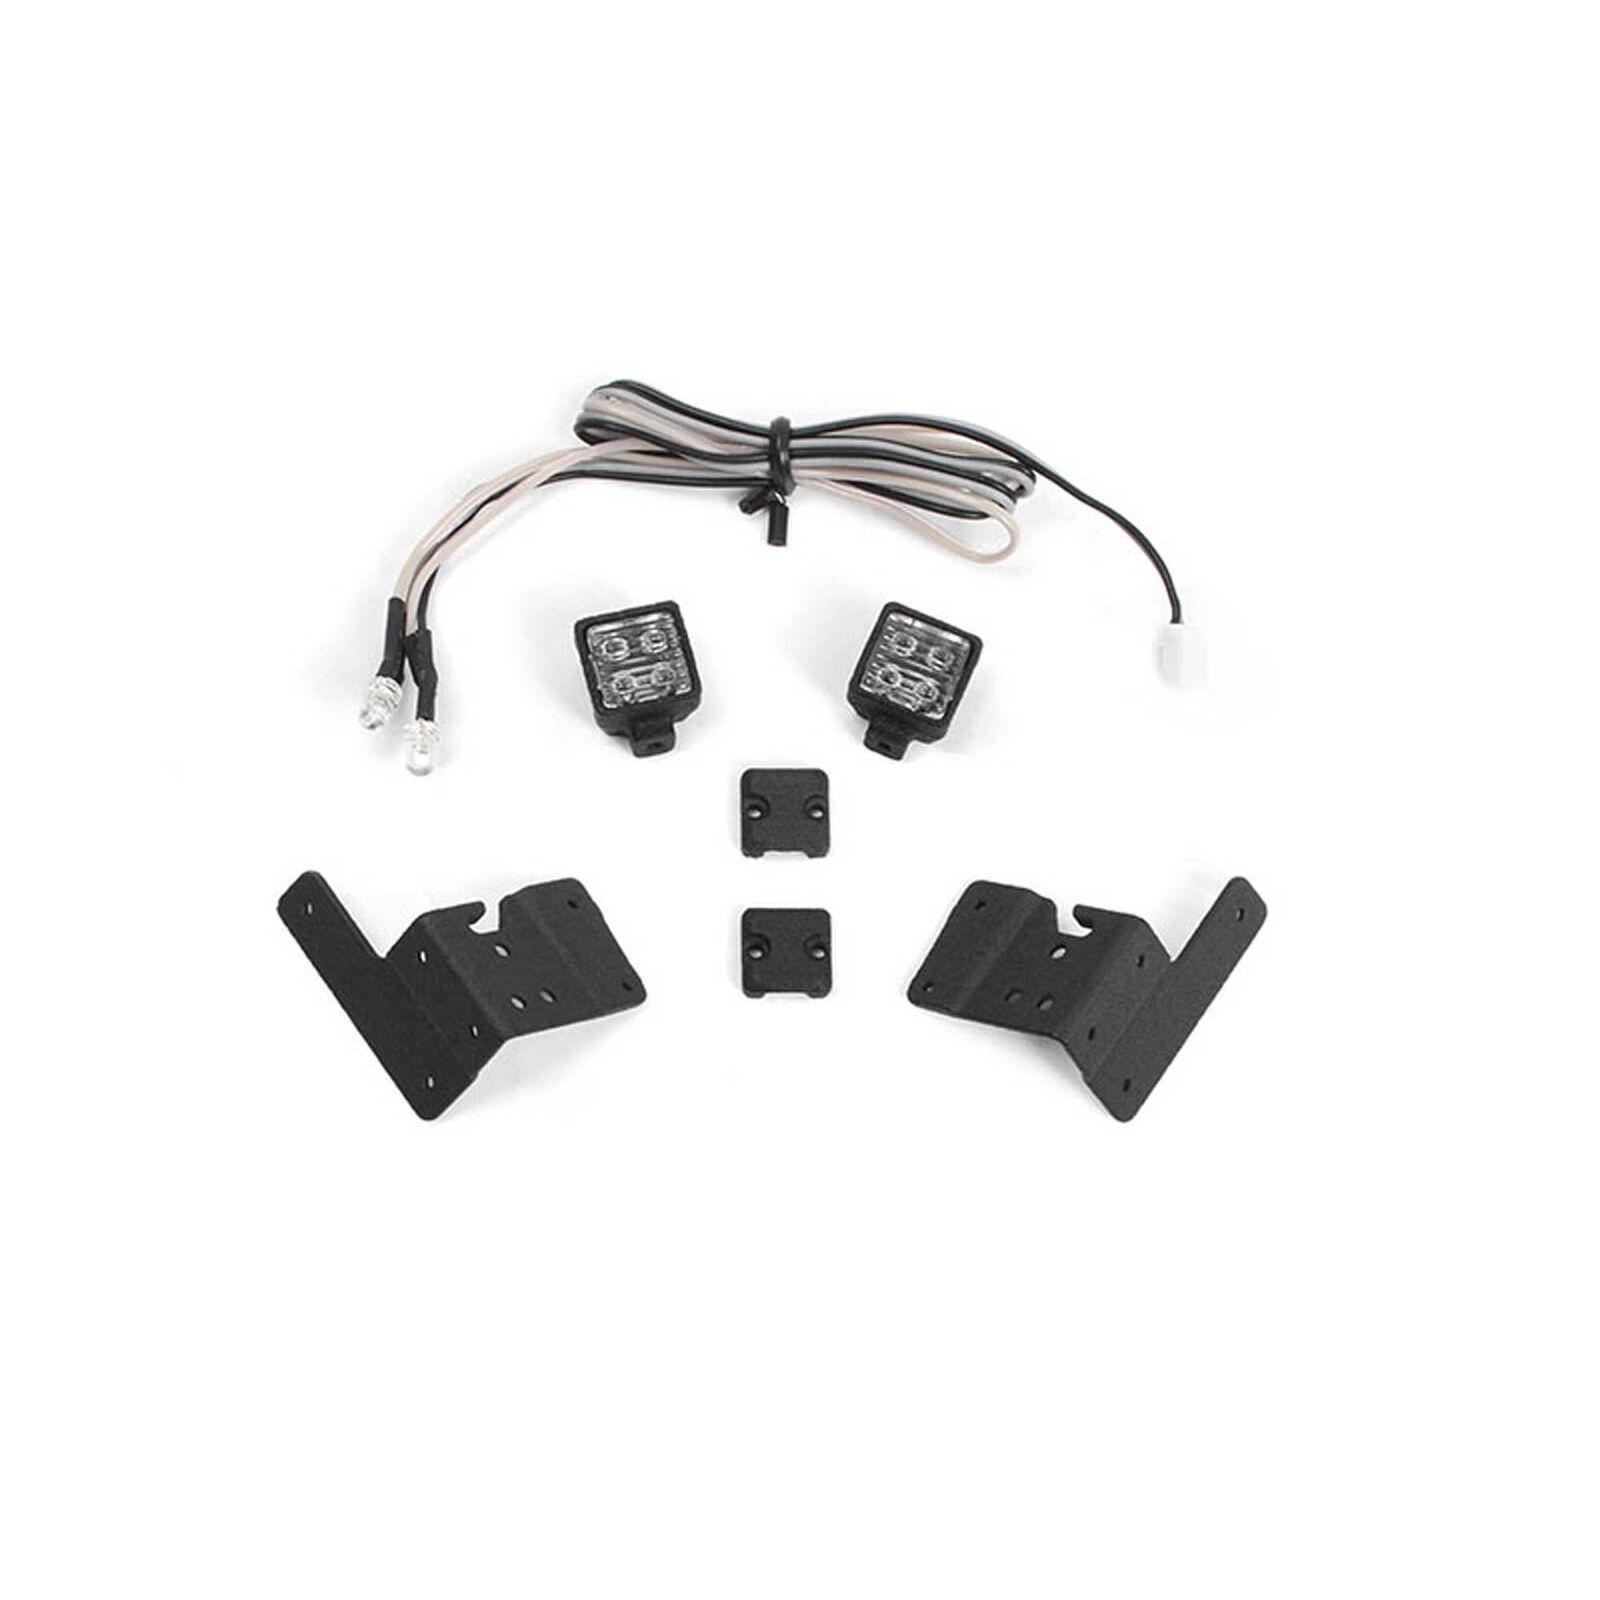 Pillar Lights Kit for Axial 1/10 SCX10 III Jeep